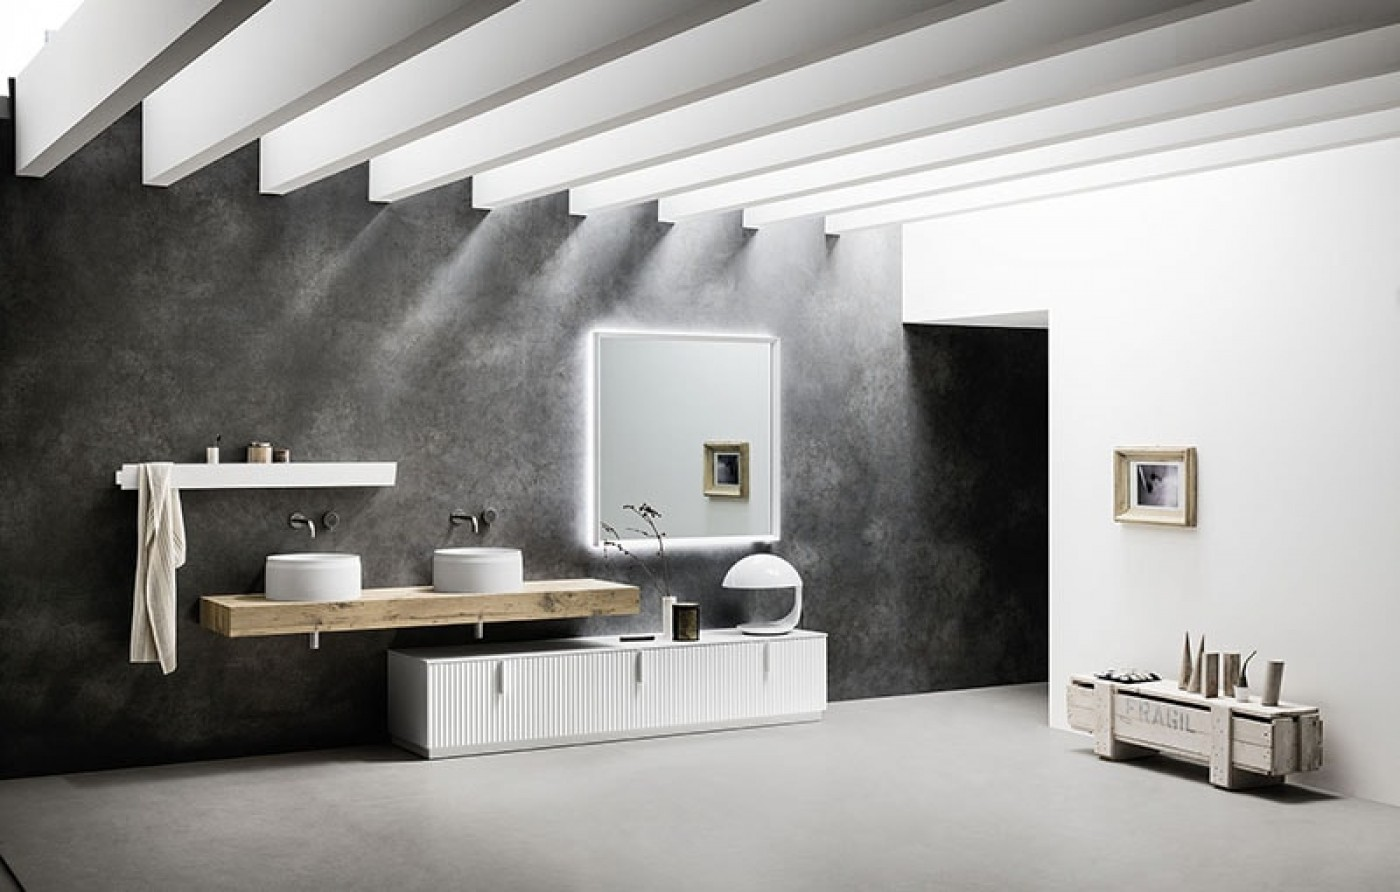 Bagni Di Design Immagini.Bagno Di Design Total Home Design